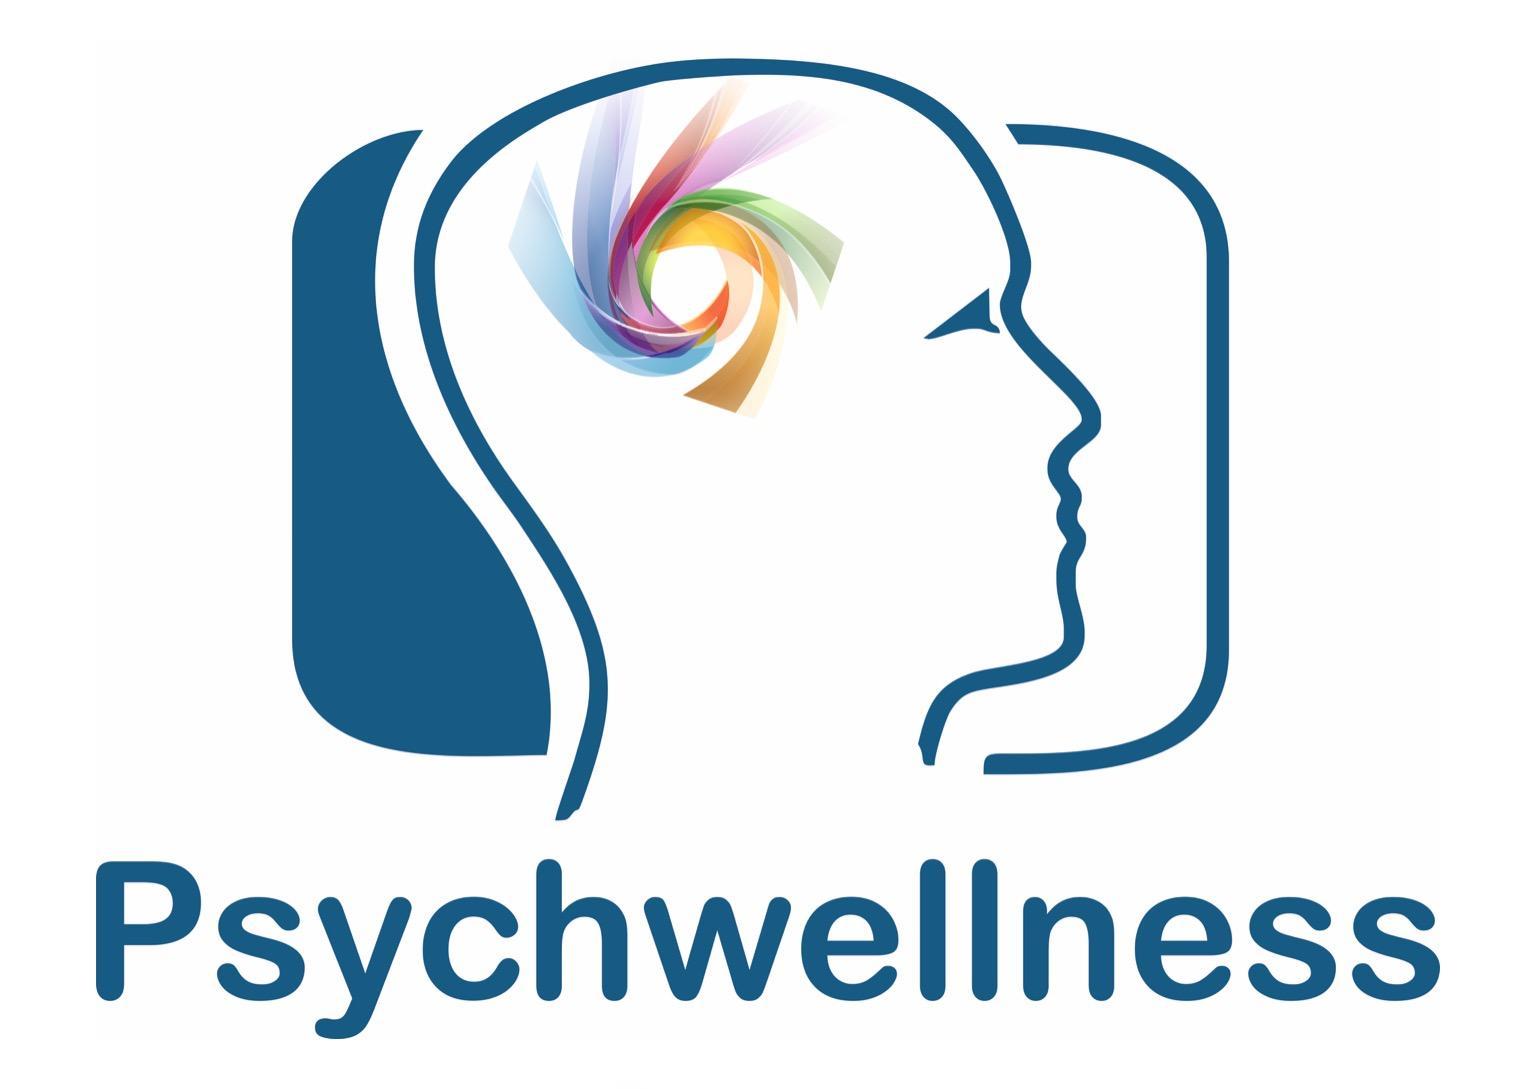 Psychwellness Clinic